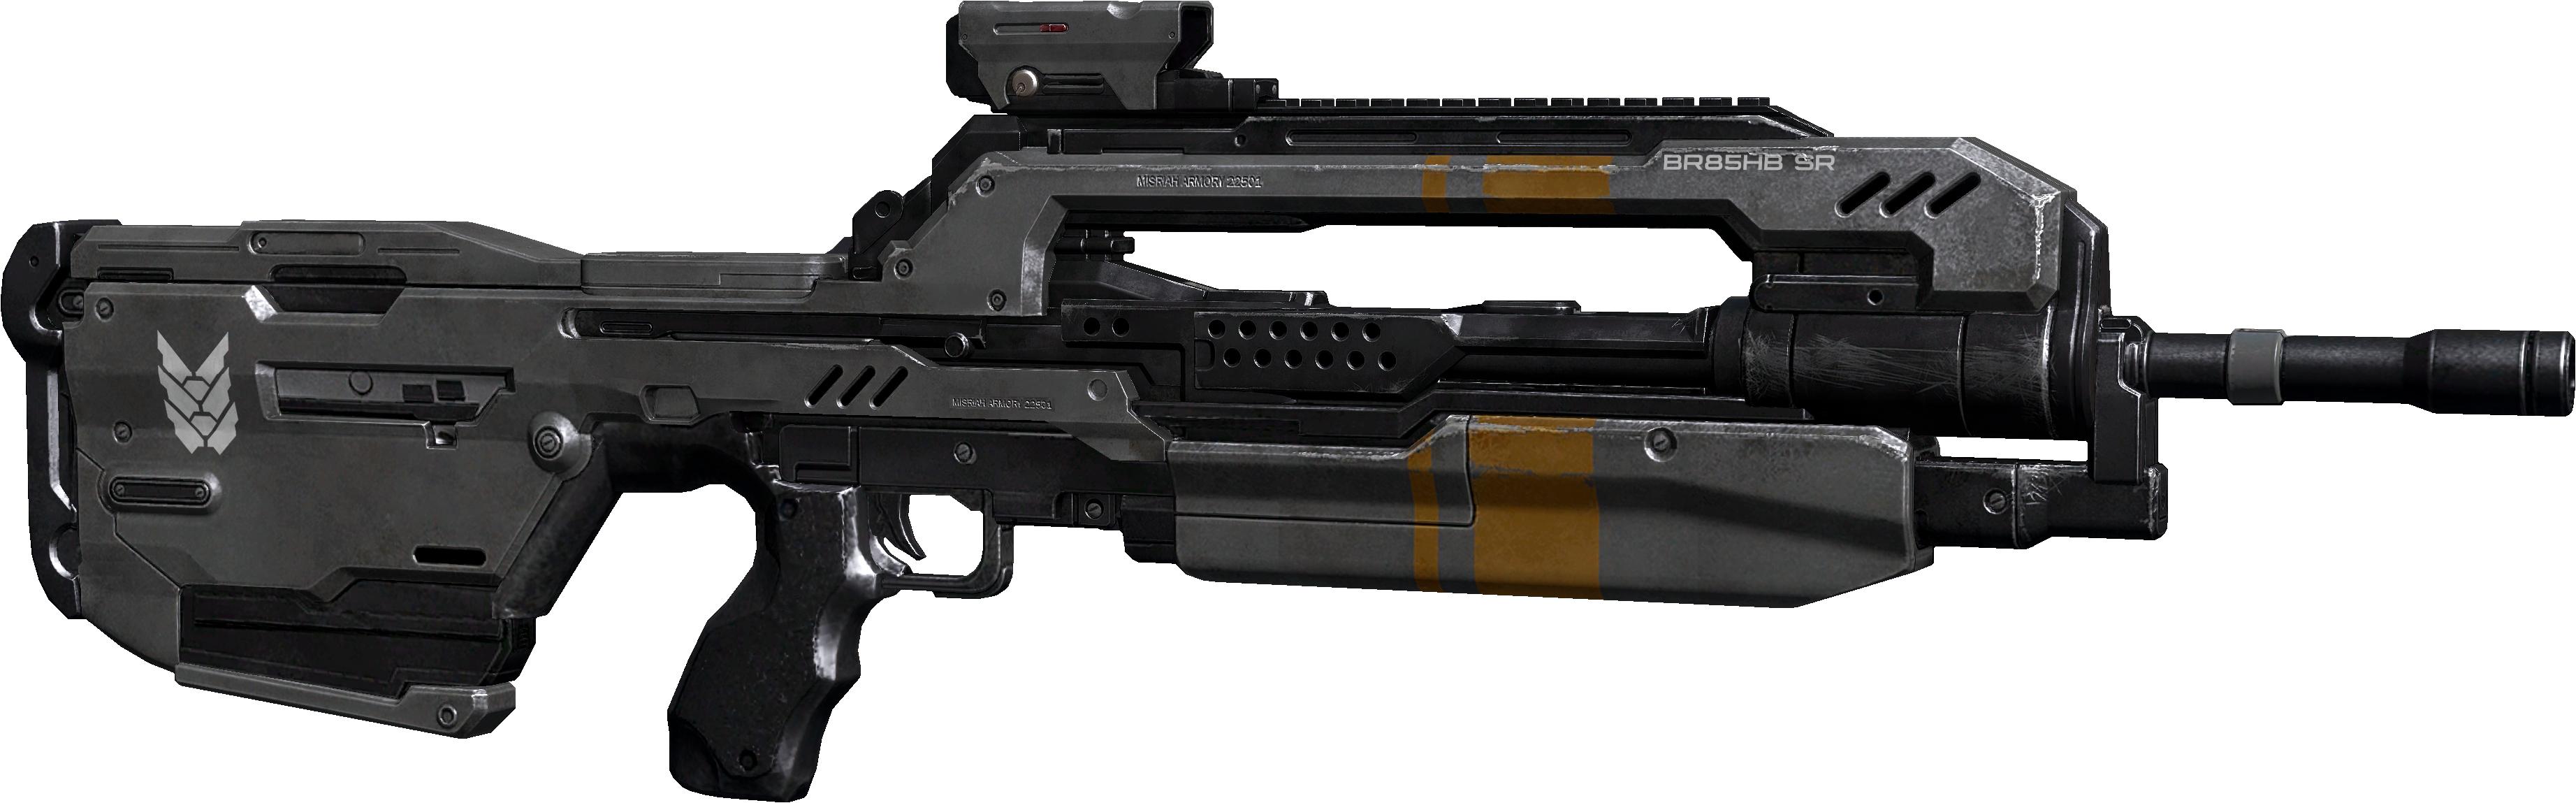 BR85 Heavy Barrel Service Rifle